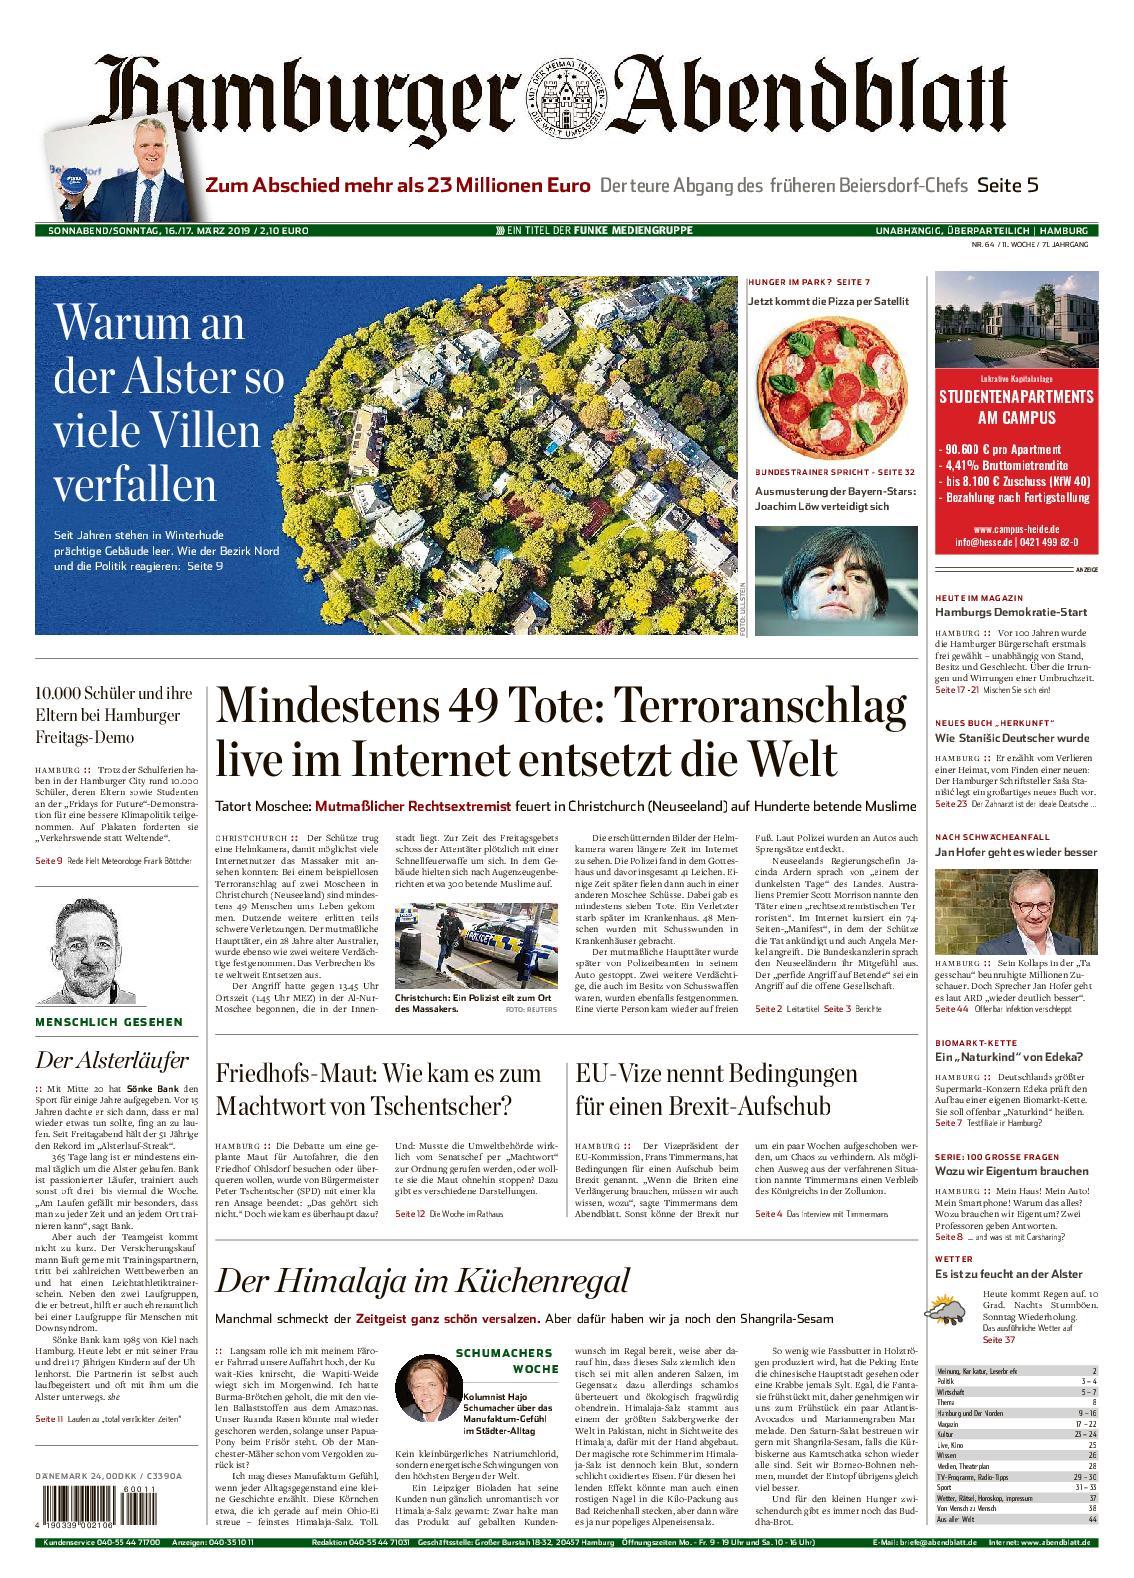 Hamburger Abendblatt Elbvororte - 16. März 2019